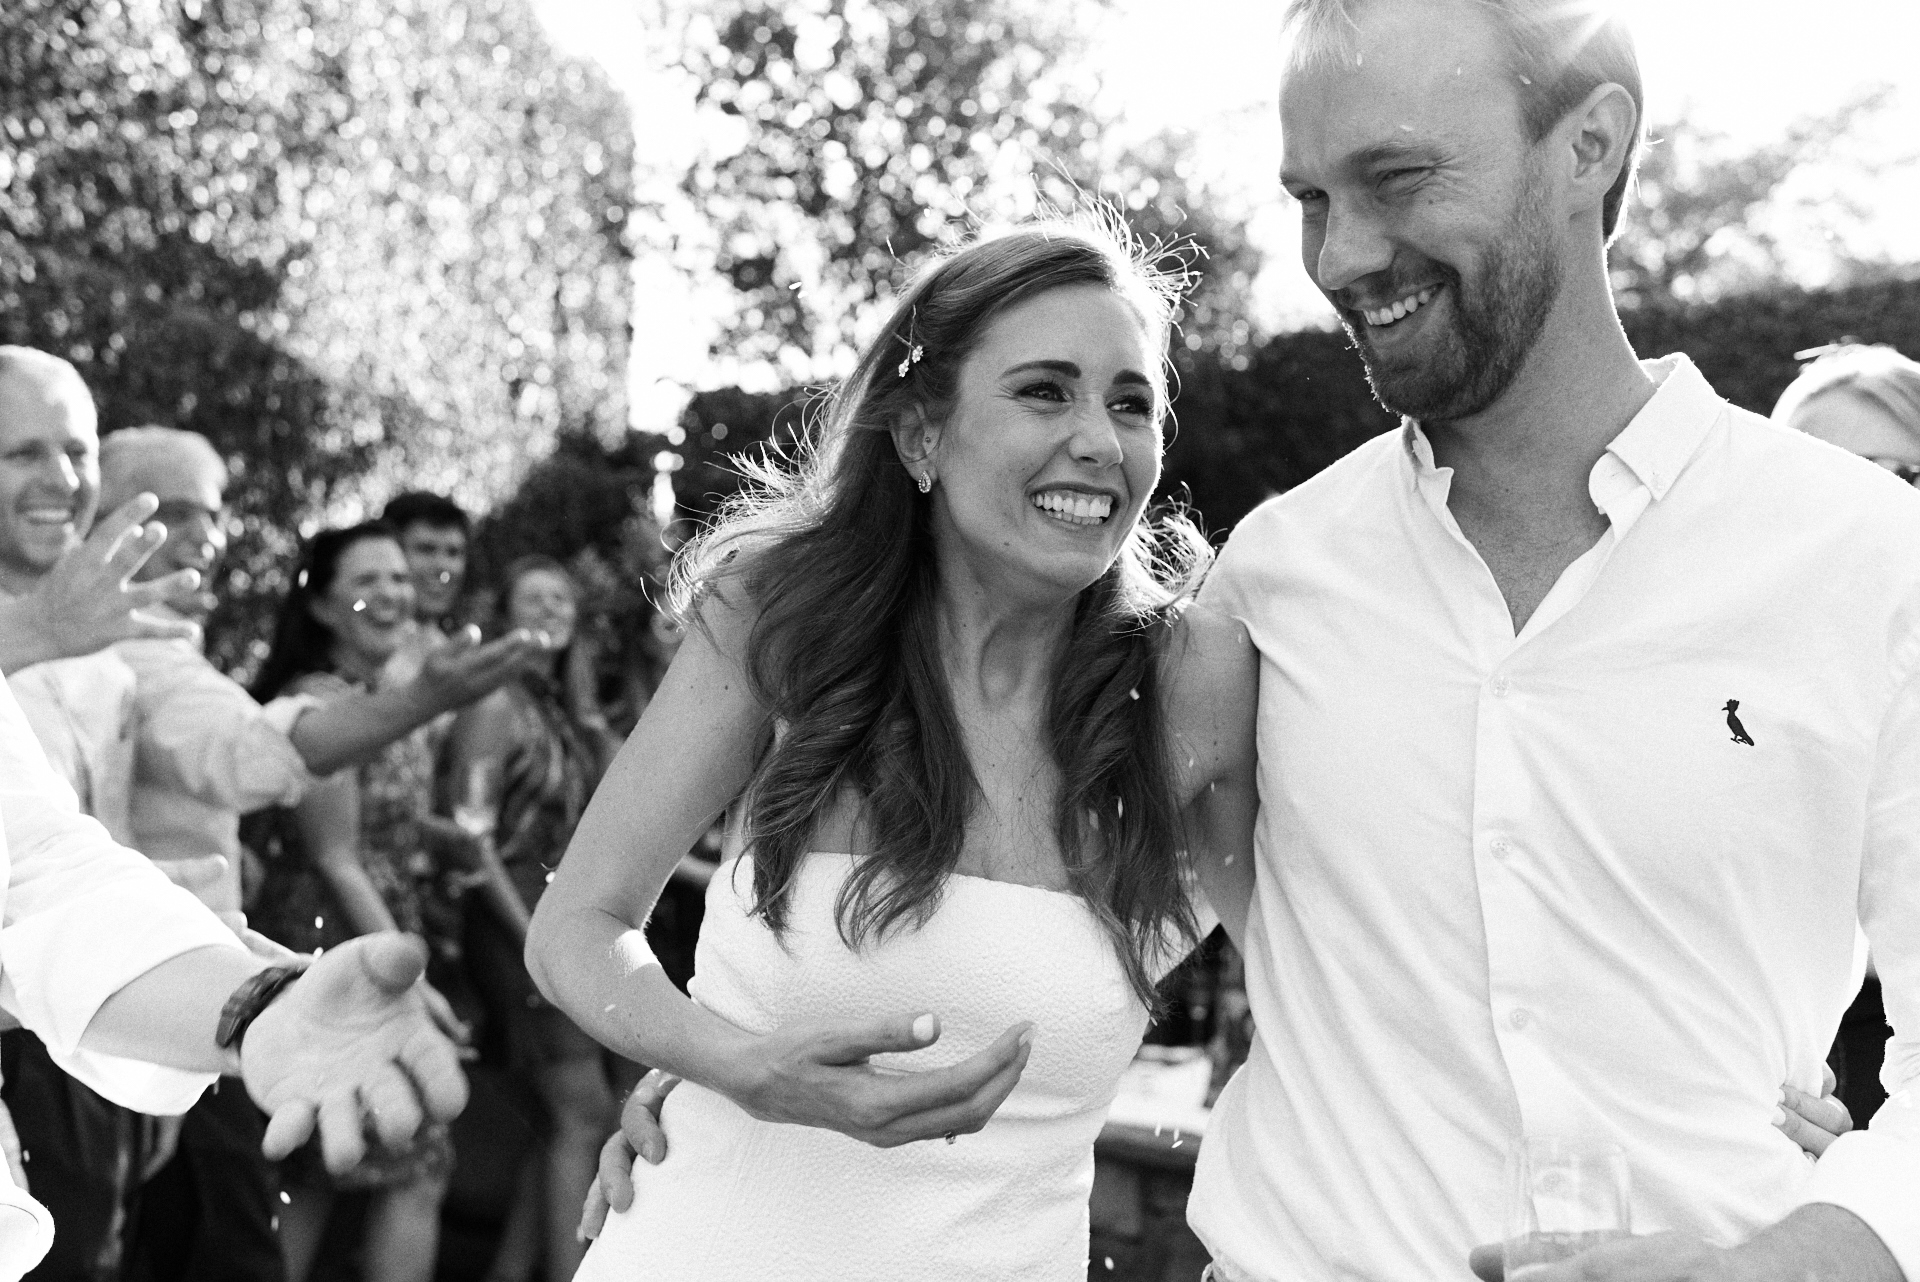 fotografo-casamento-mini-wedding-curitiba-110.jpg